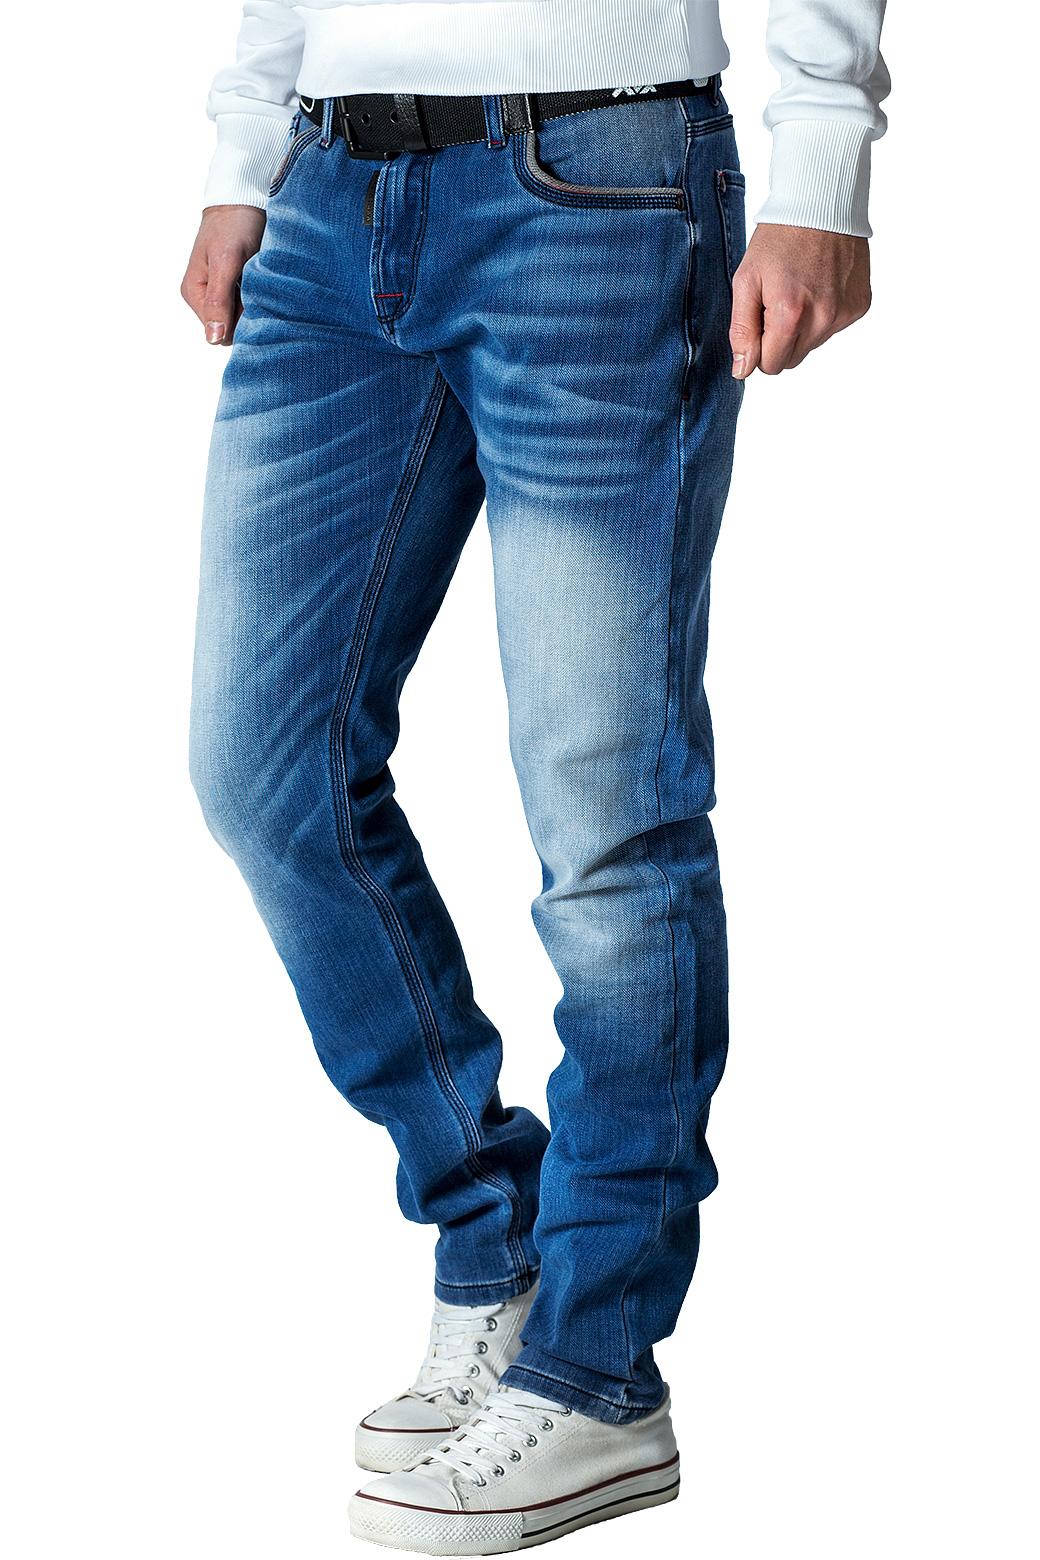 Cipo-amp-Baxx-Uomo-Jeans-Pantaloni-ricamate-Biker-Style-streetwear-nervature-pattern-Dope miniatura 21